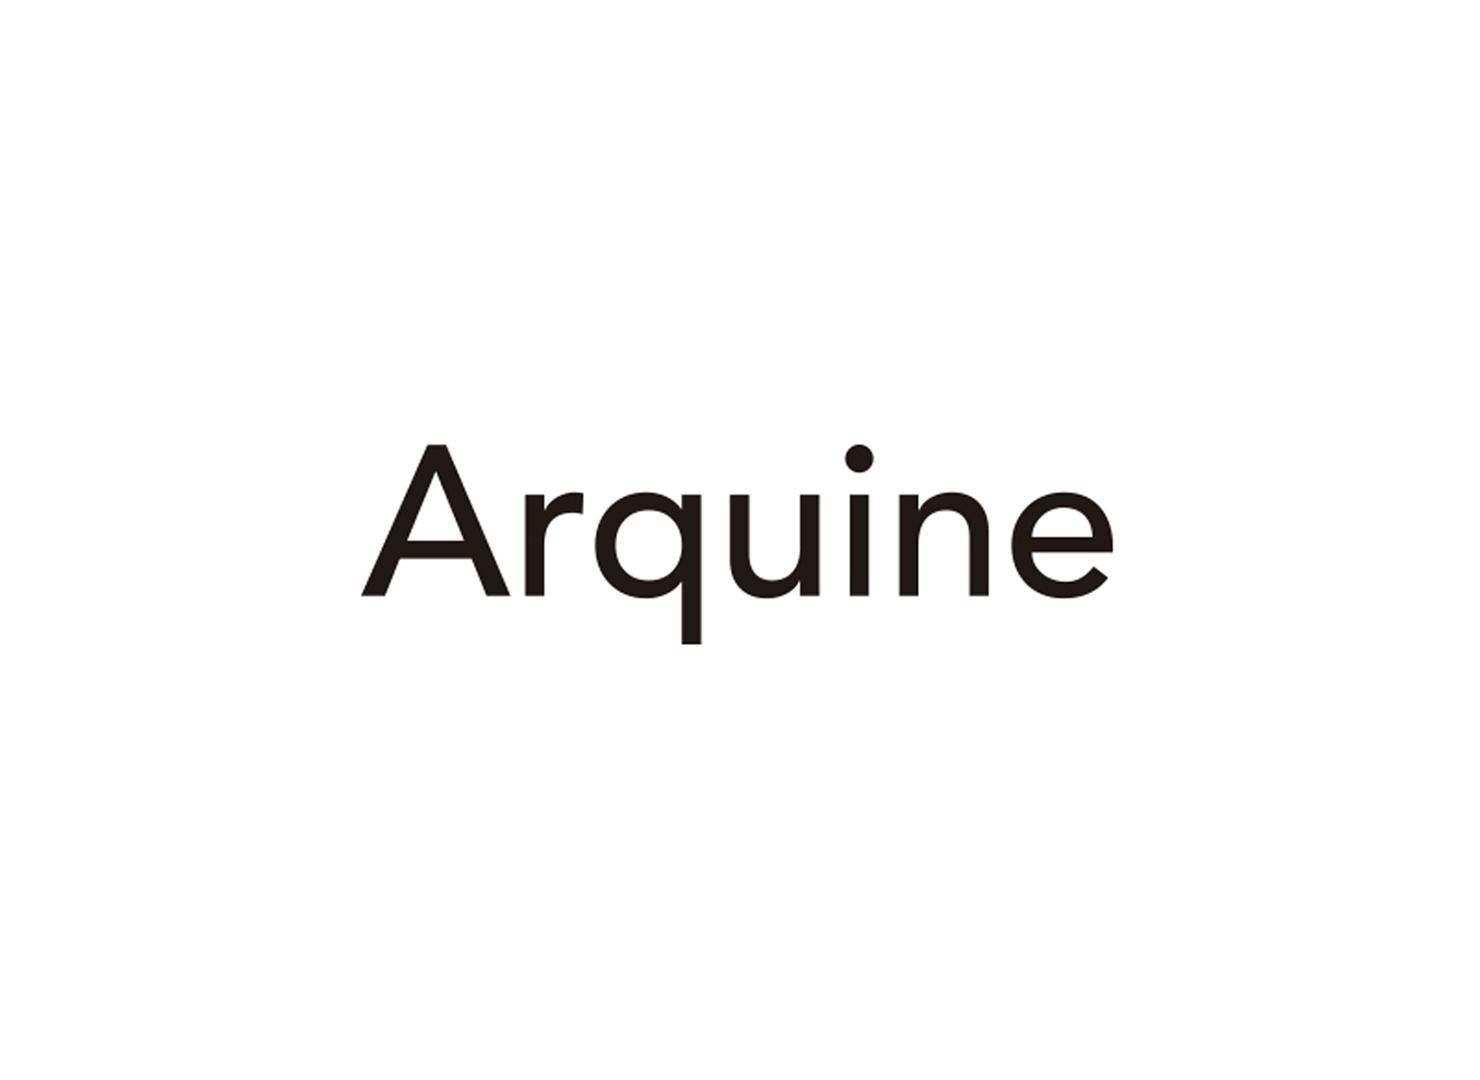 arquine_cumulolimbo-studio_natalia-matesanz